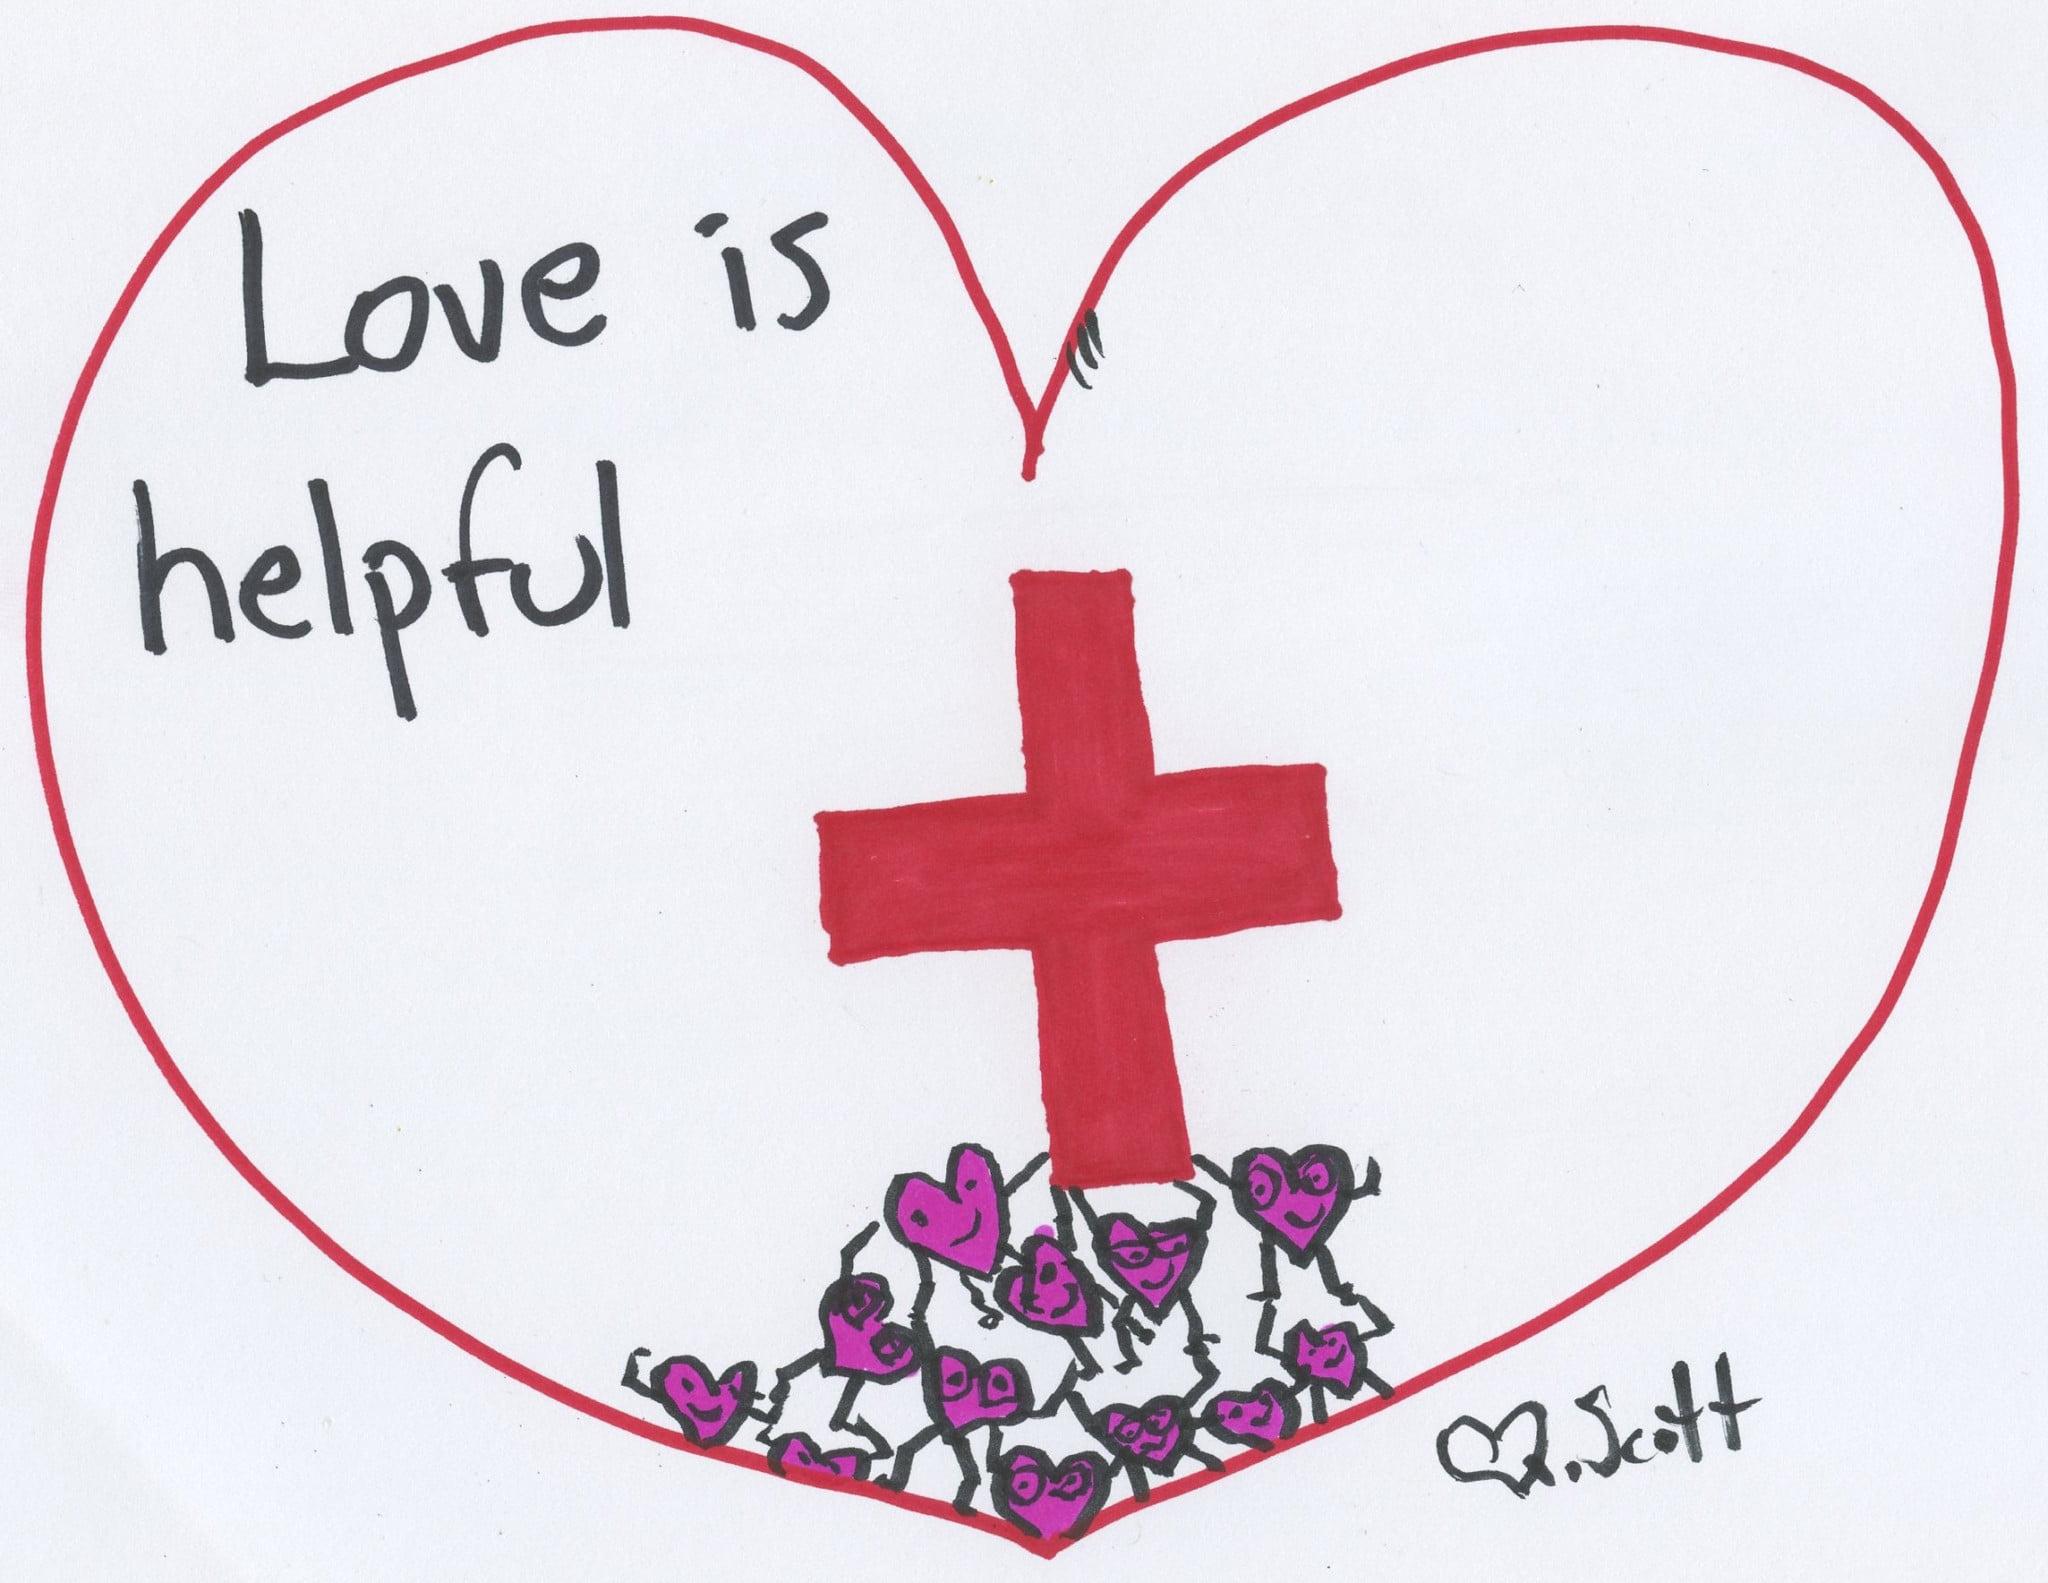 Love is helpful